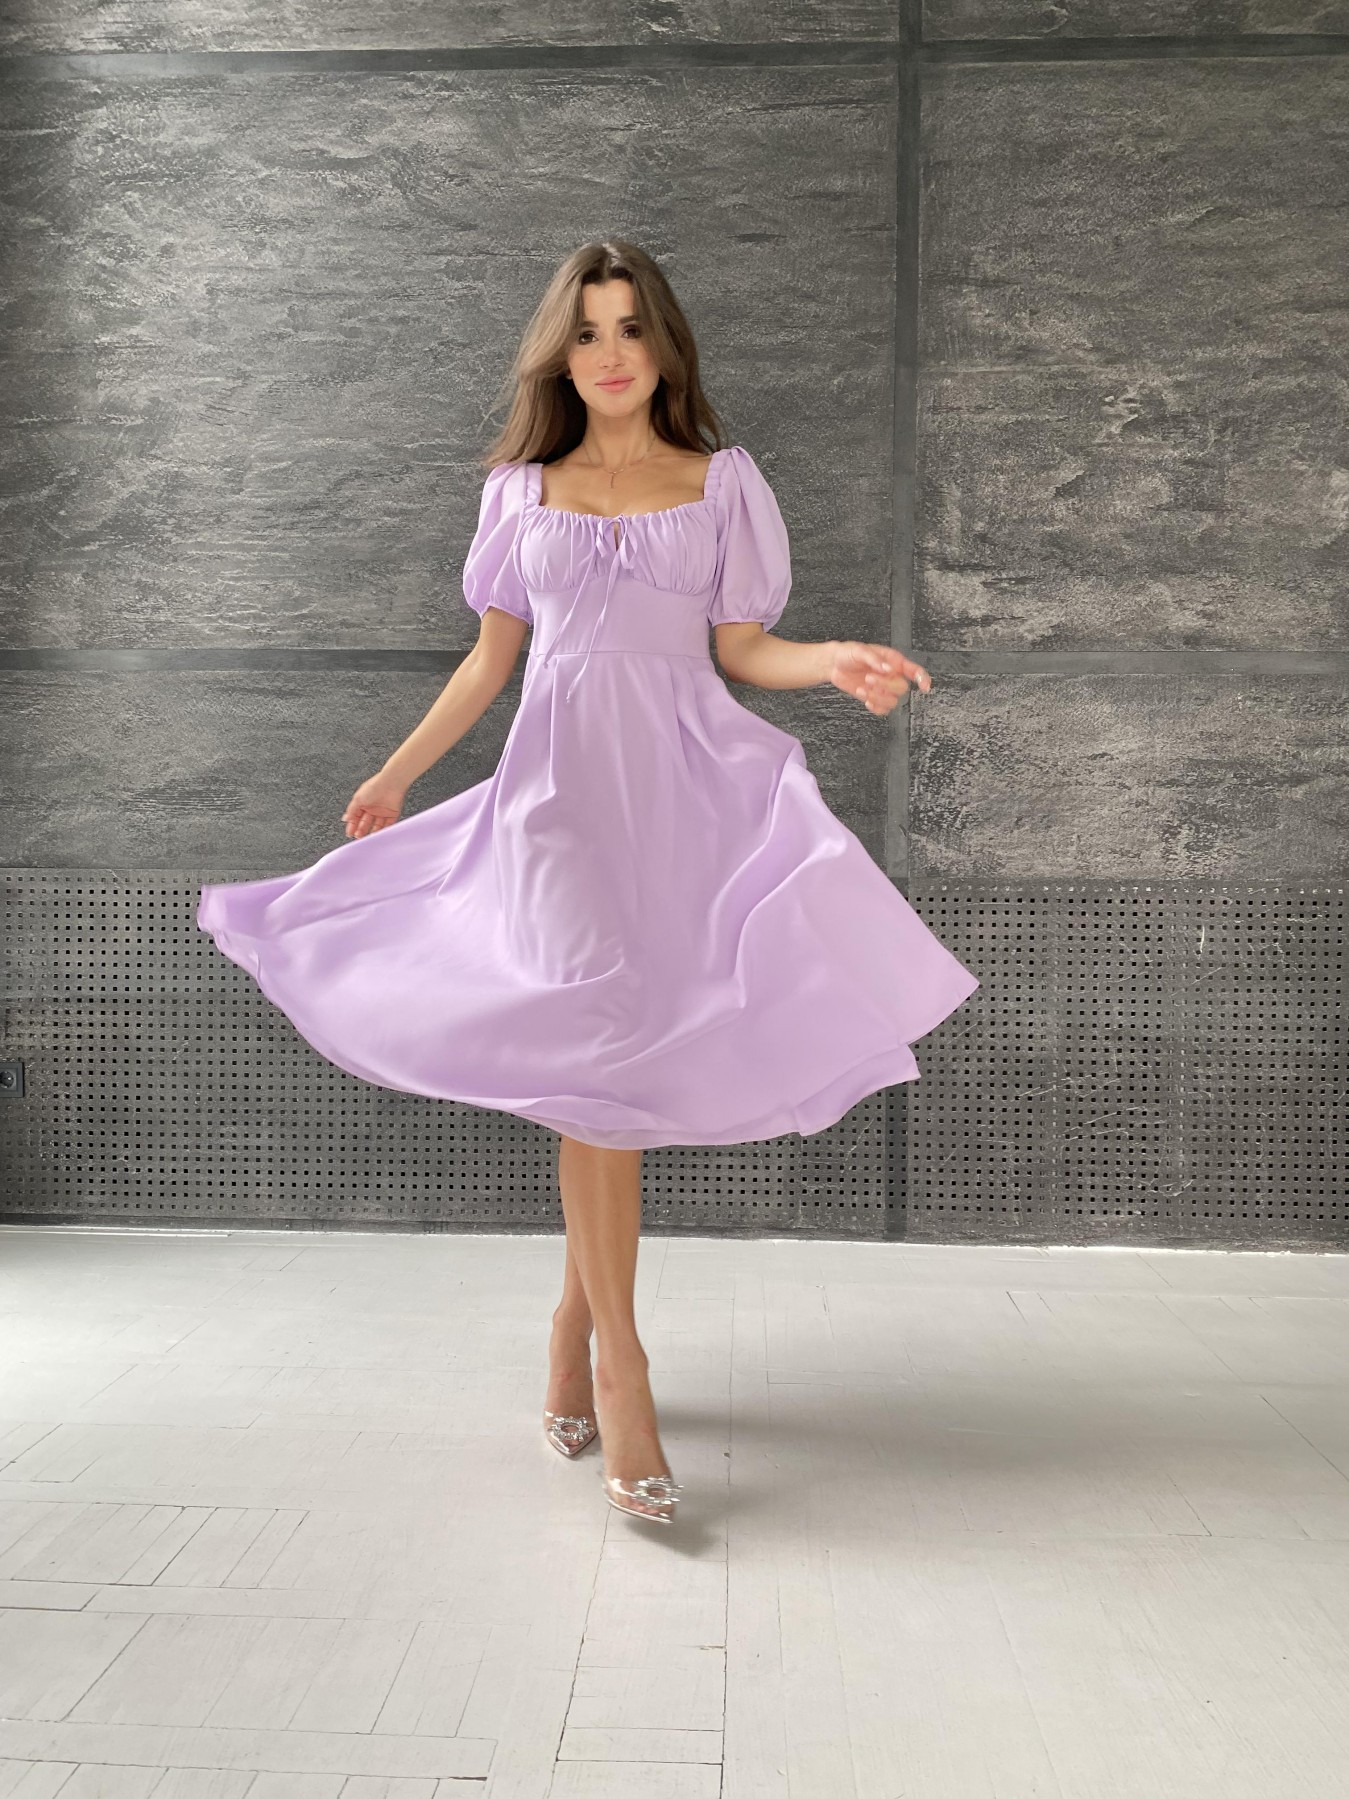 Кисес Миди платье из шифона креп 11443 АРТ. 48311 Цвет: Лаванда - фото 3, интернет магазин tm-modus.ru